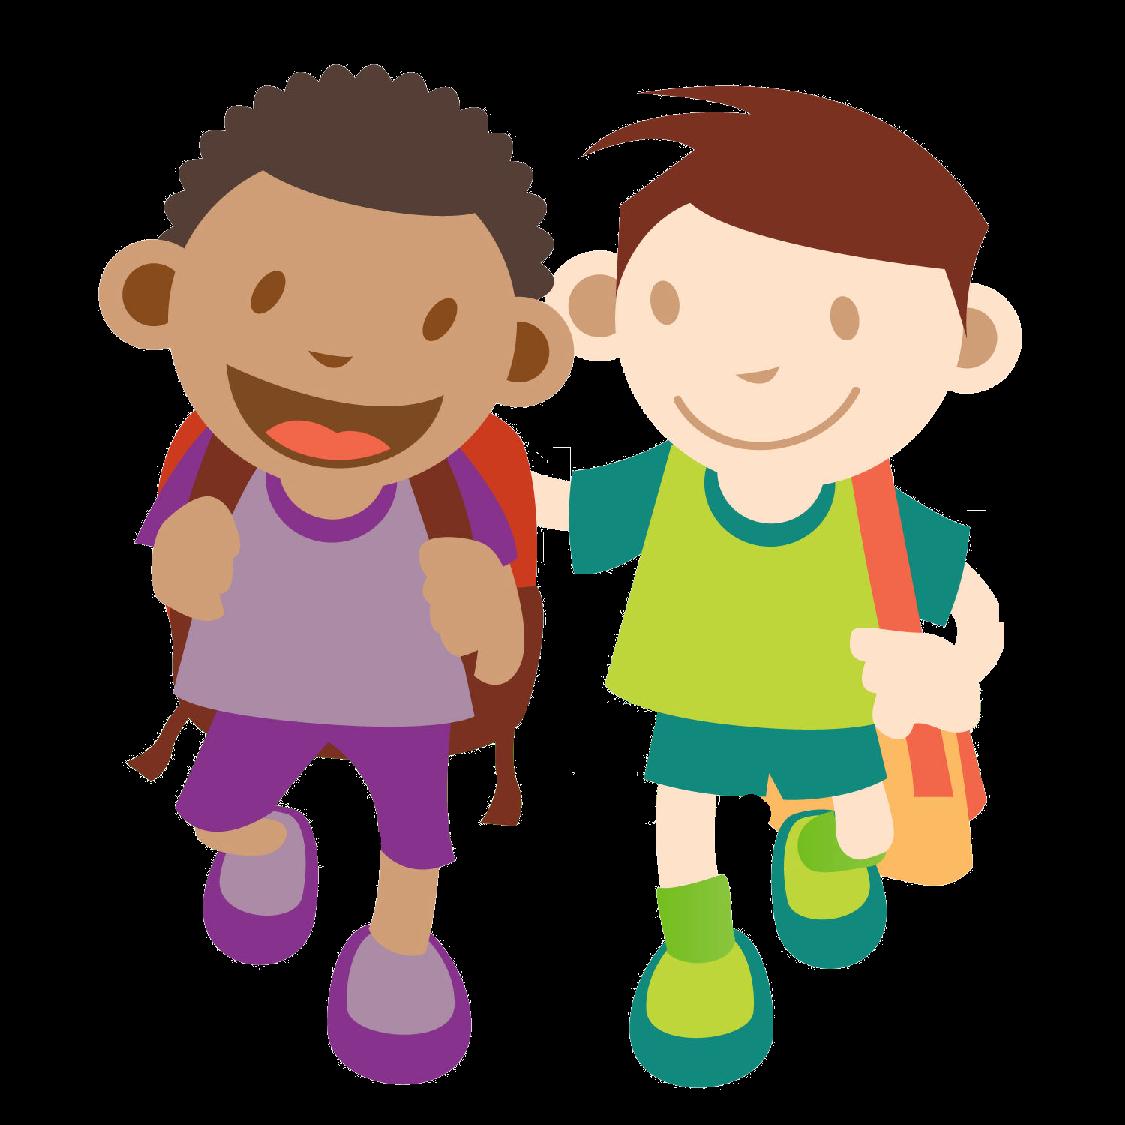 1125x1125 Kids Walking Clipart